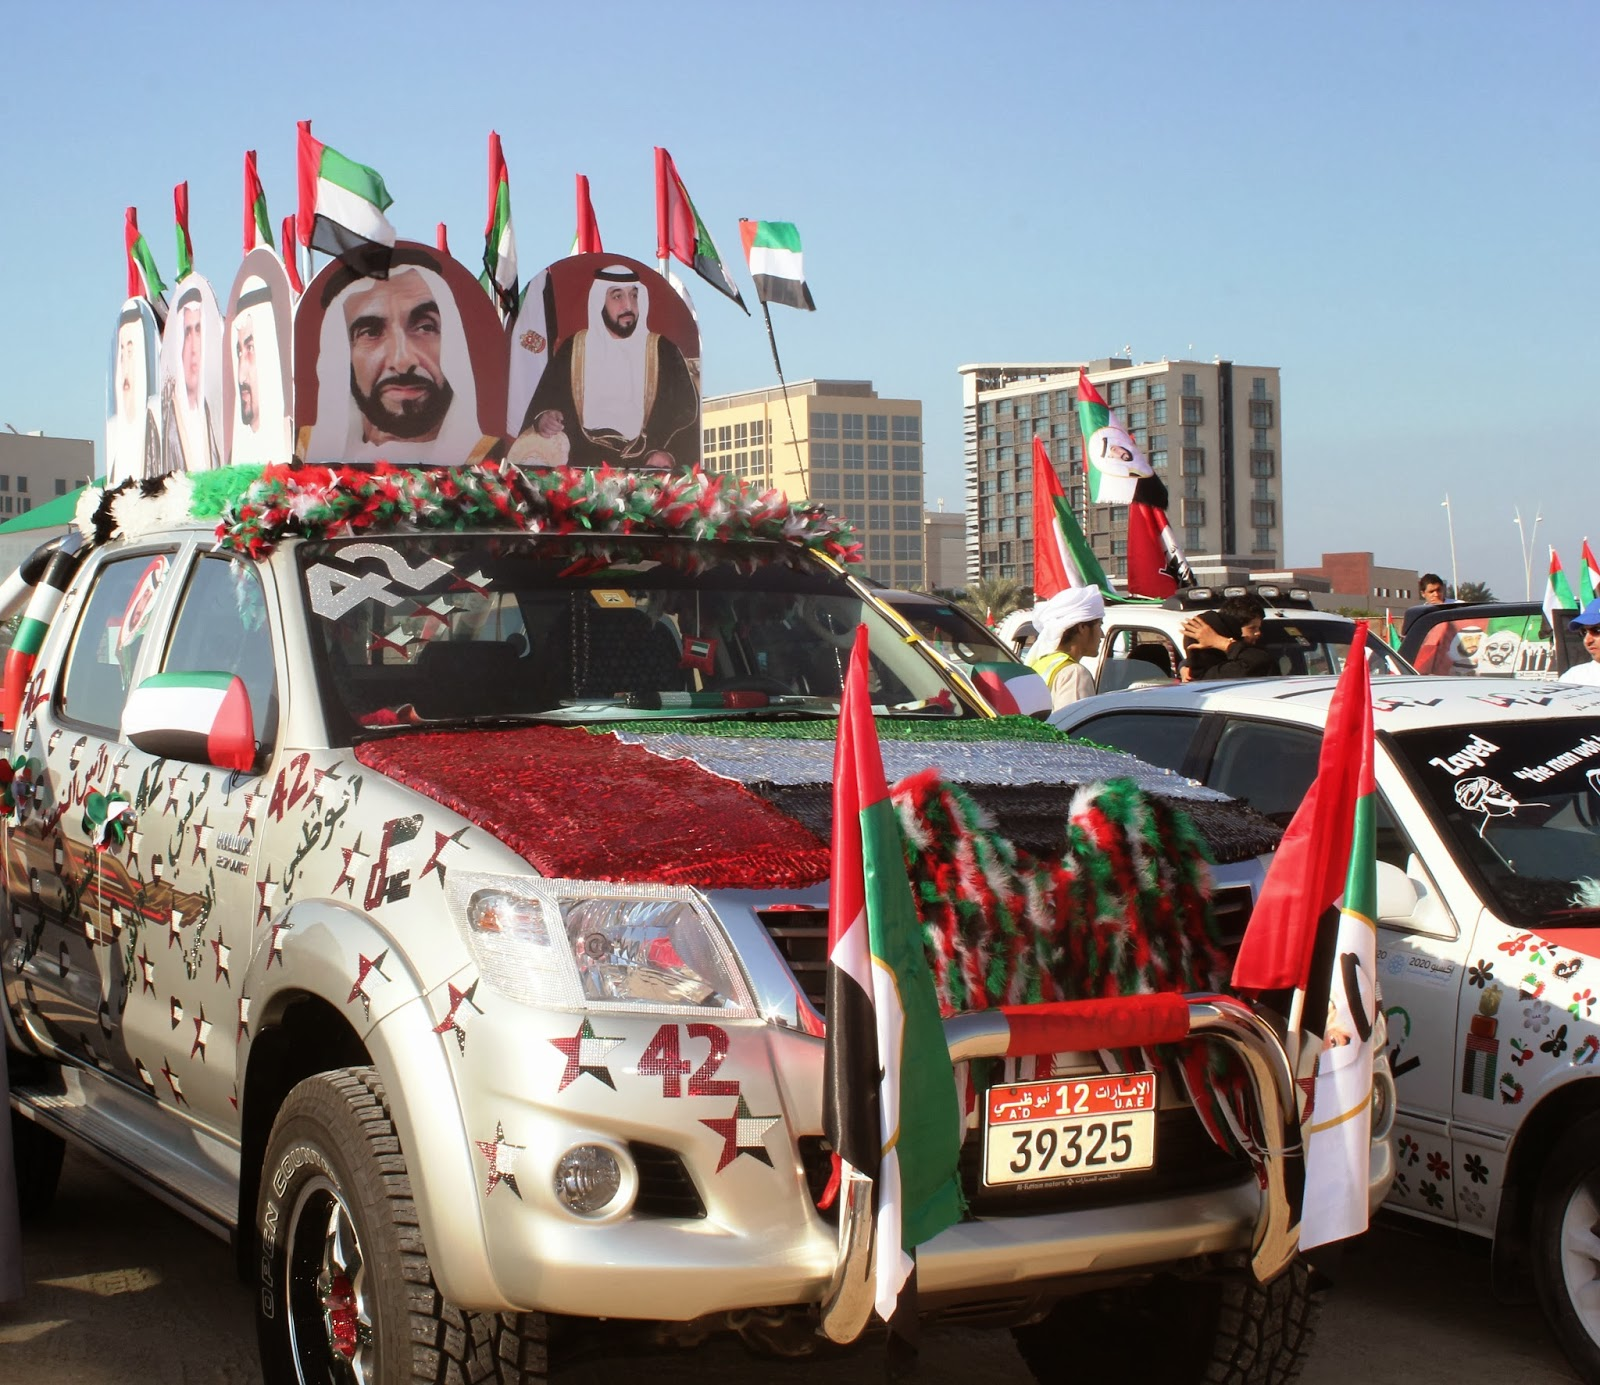 Uae National Day Gifts Burj Khalifa: Arabian Tales And Other Amazing Adventures: UAE National